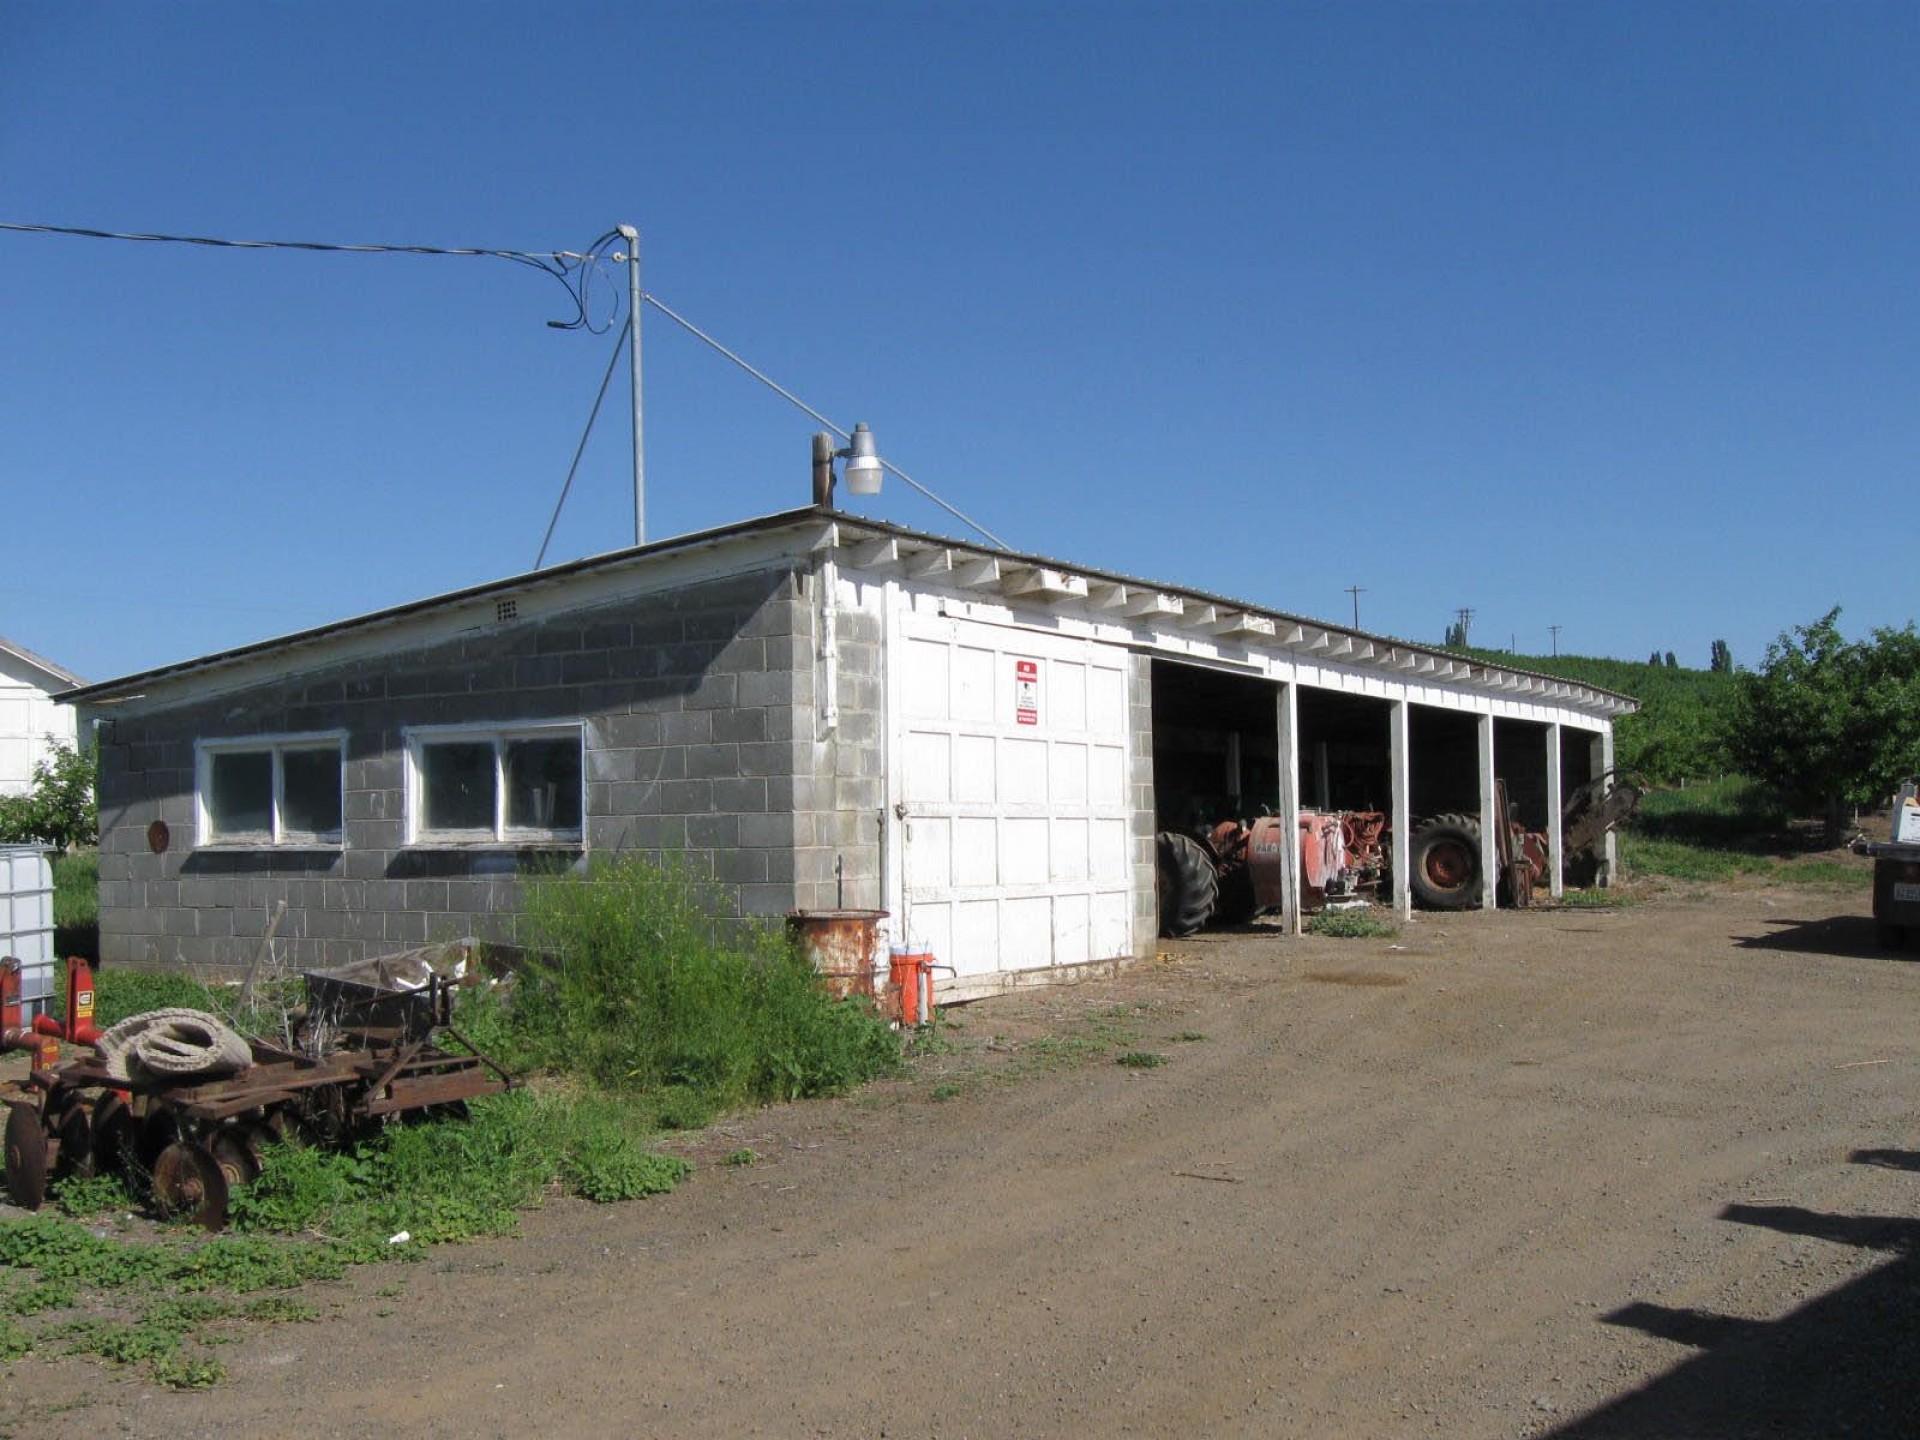 Kingdom Ranch of Cowiche 7